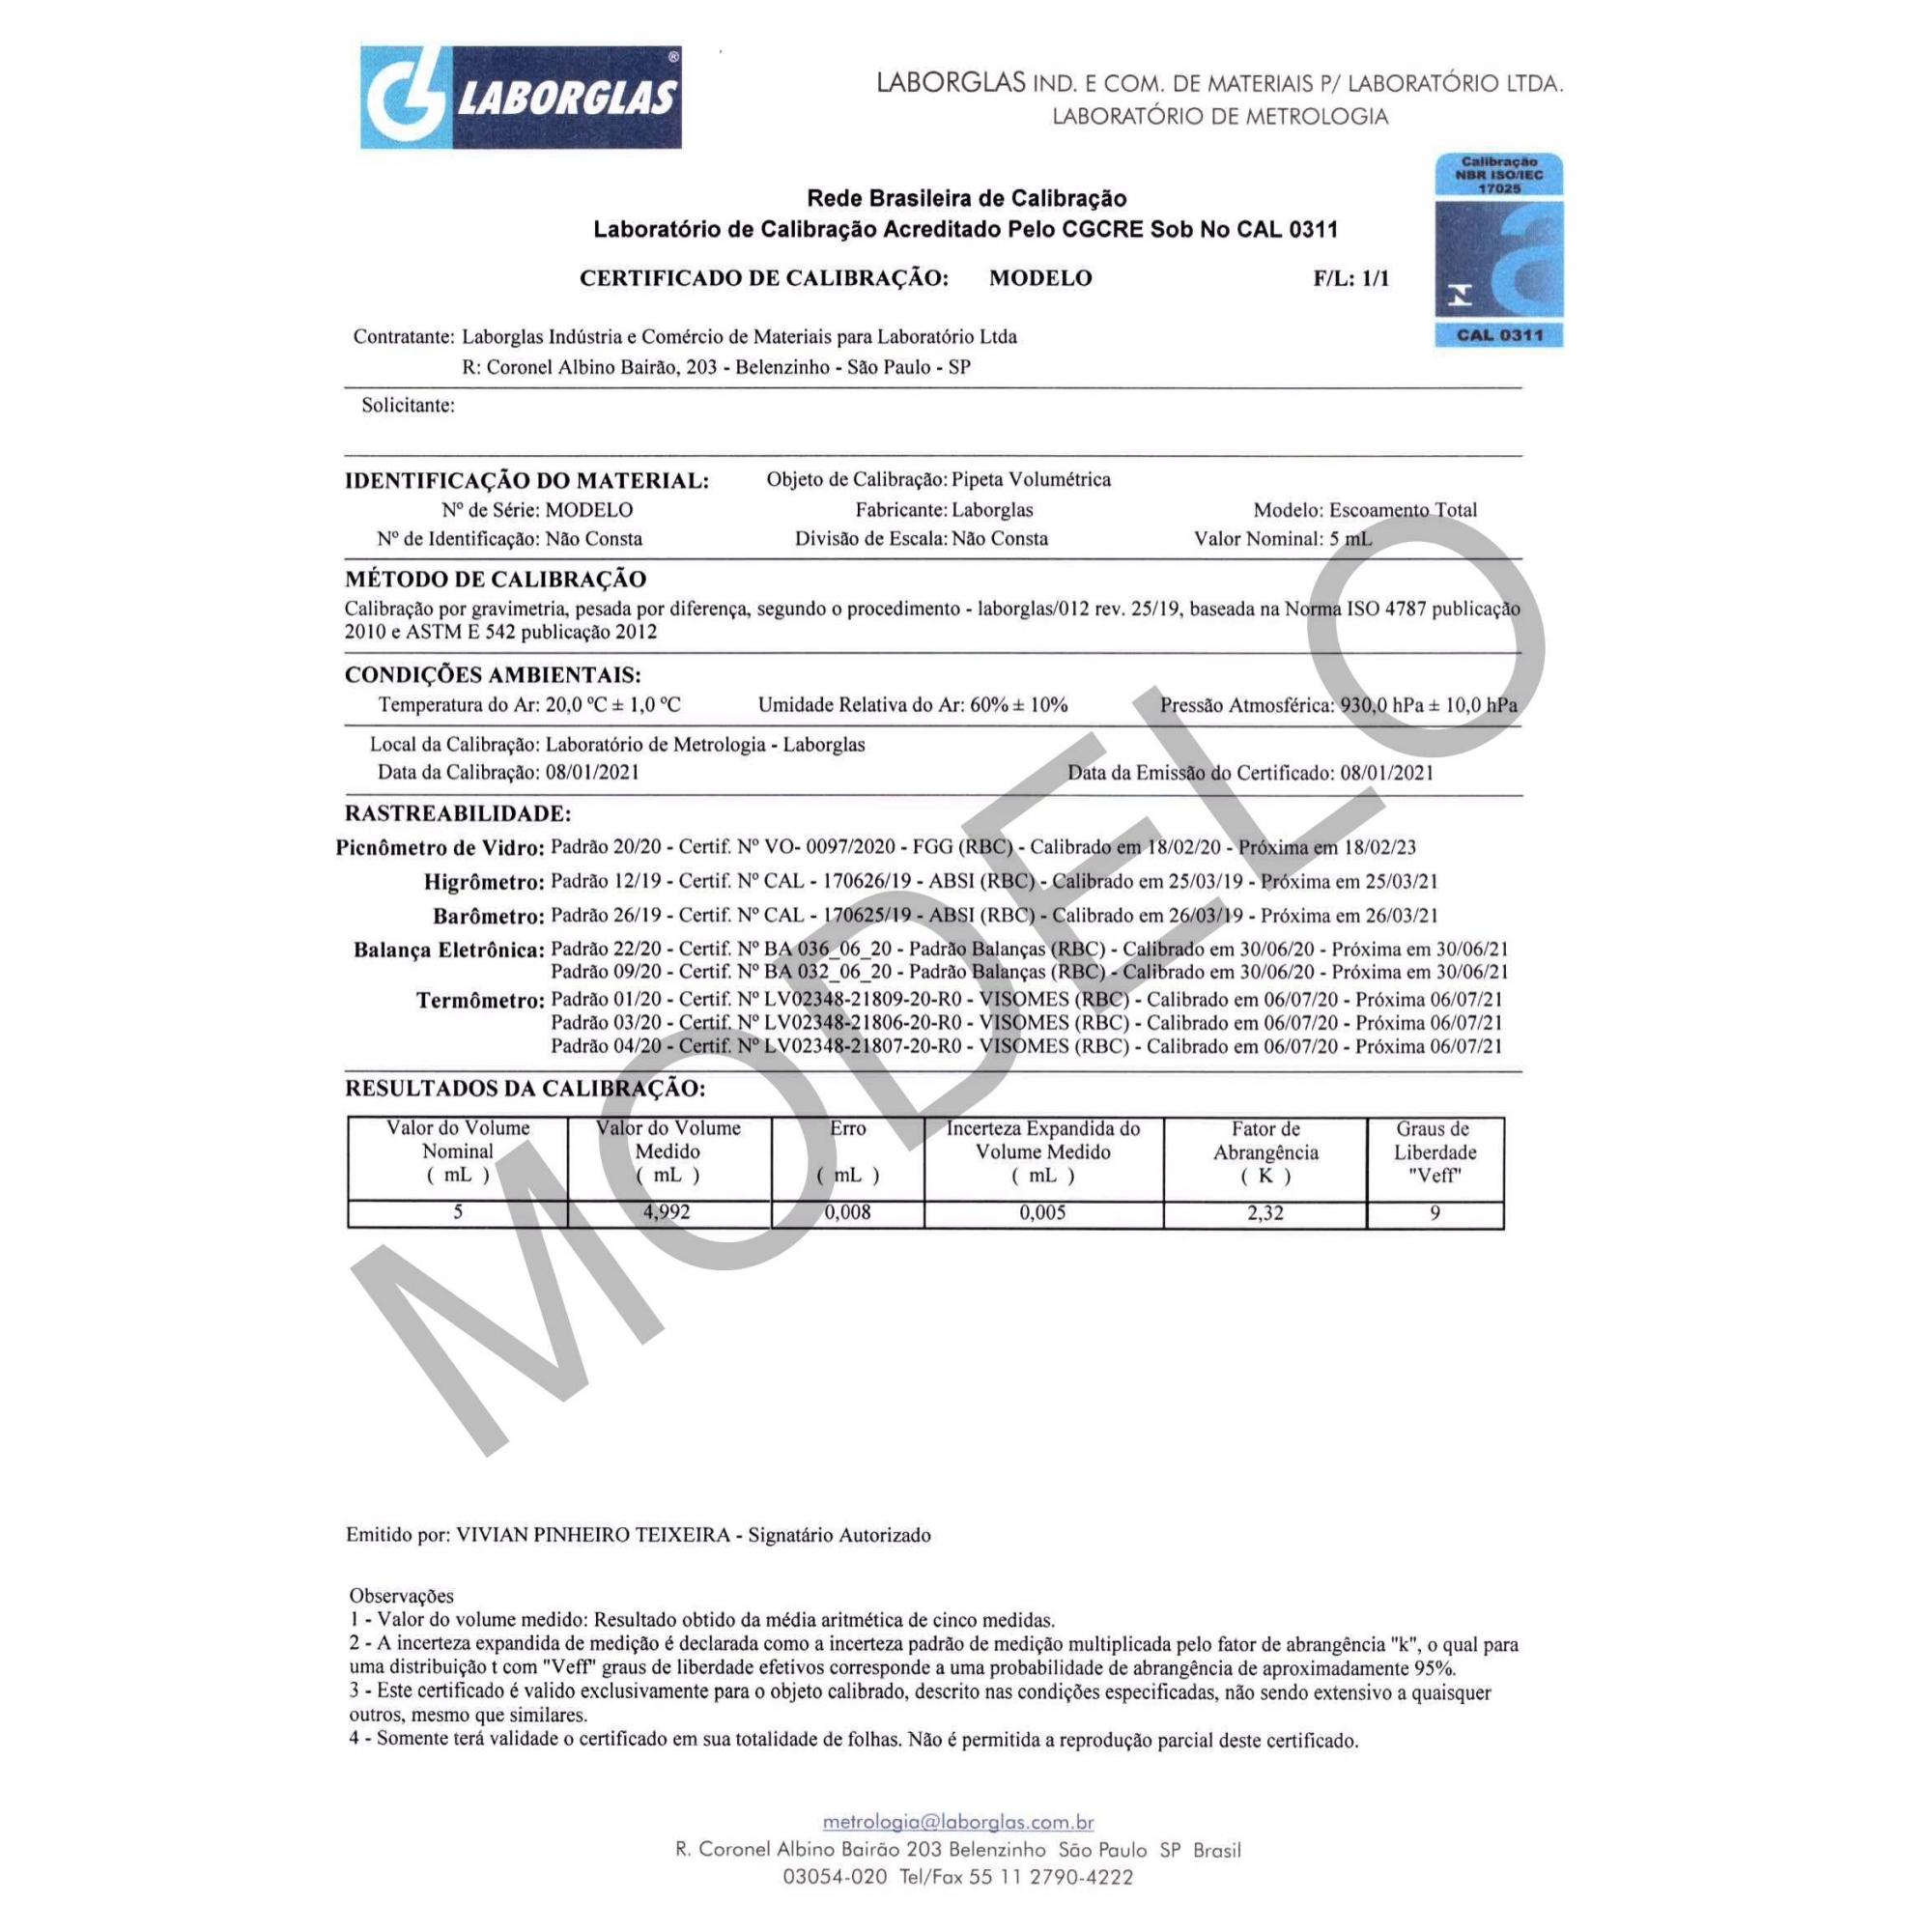 PIPETA VOLUMÉTRICA ESGOTAMENTO TOTAL 4,5 ML CERTIFICADO RBC - Laborglas - Cód. 9433722-R